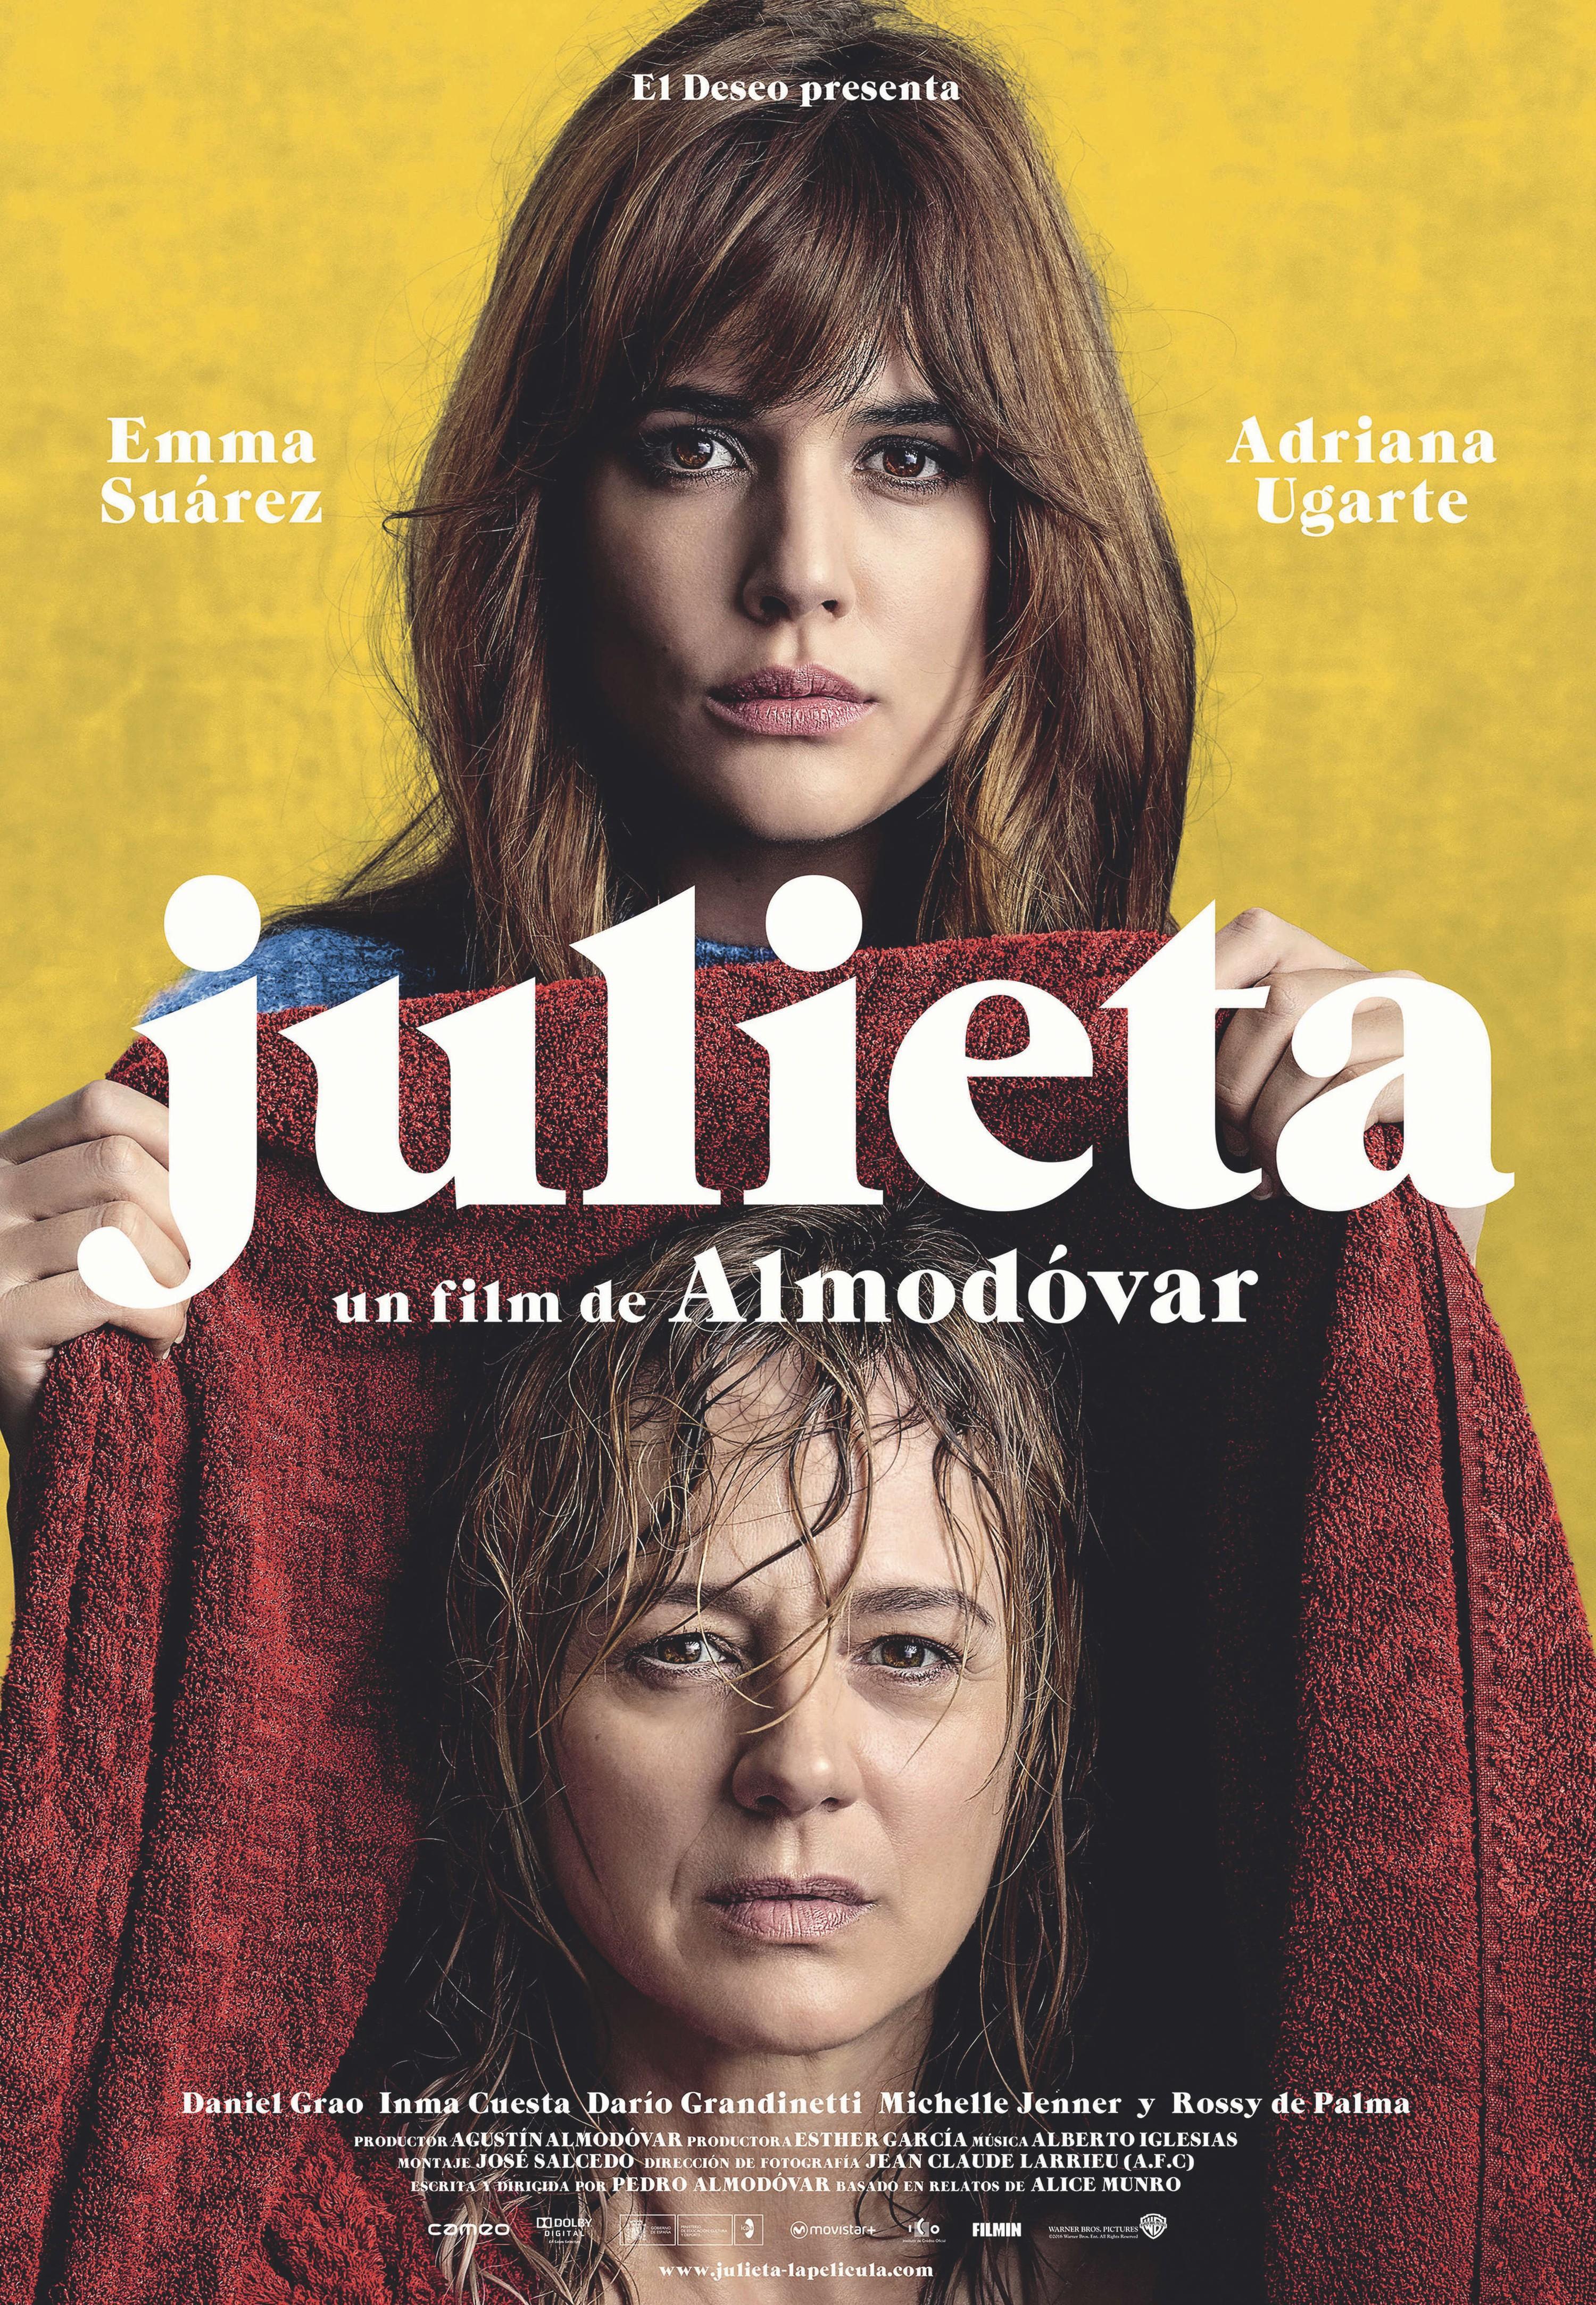 Cartel de Julieta, Pedro Almodóvar, 2016.